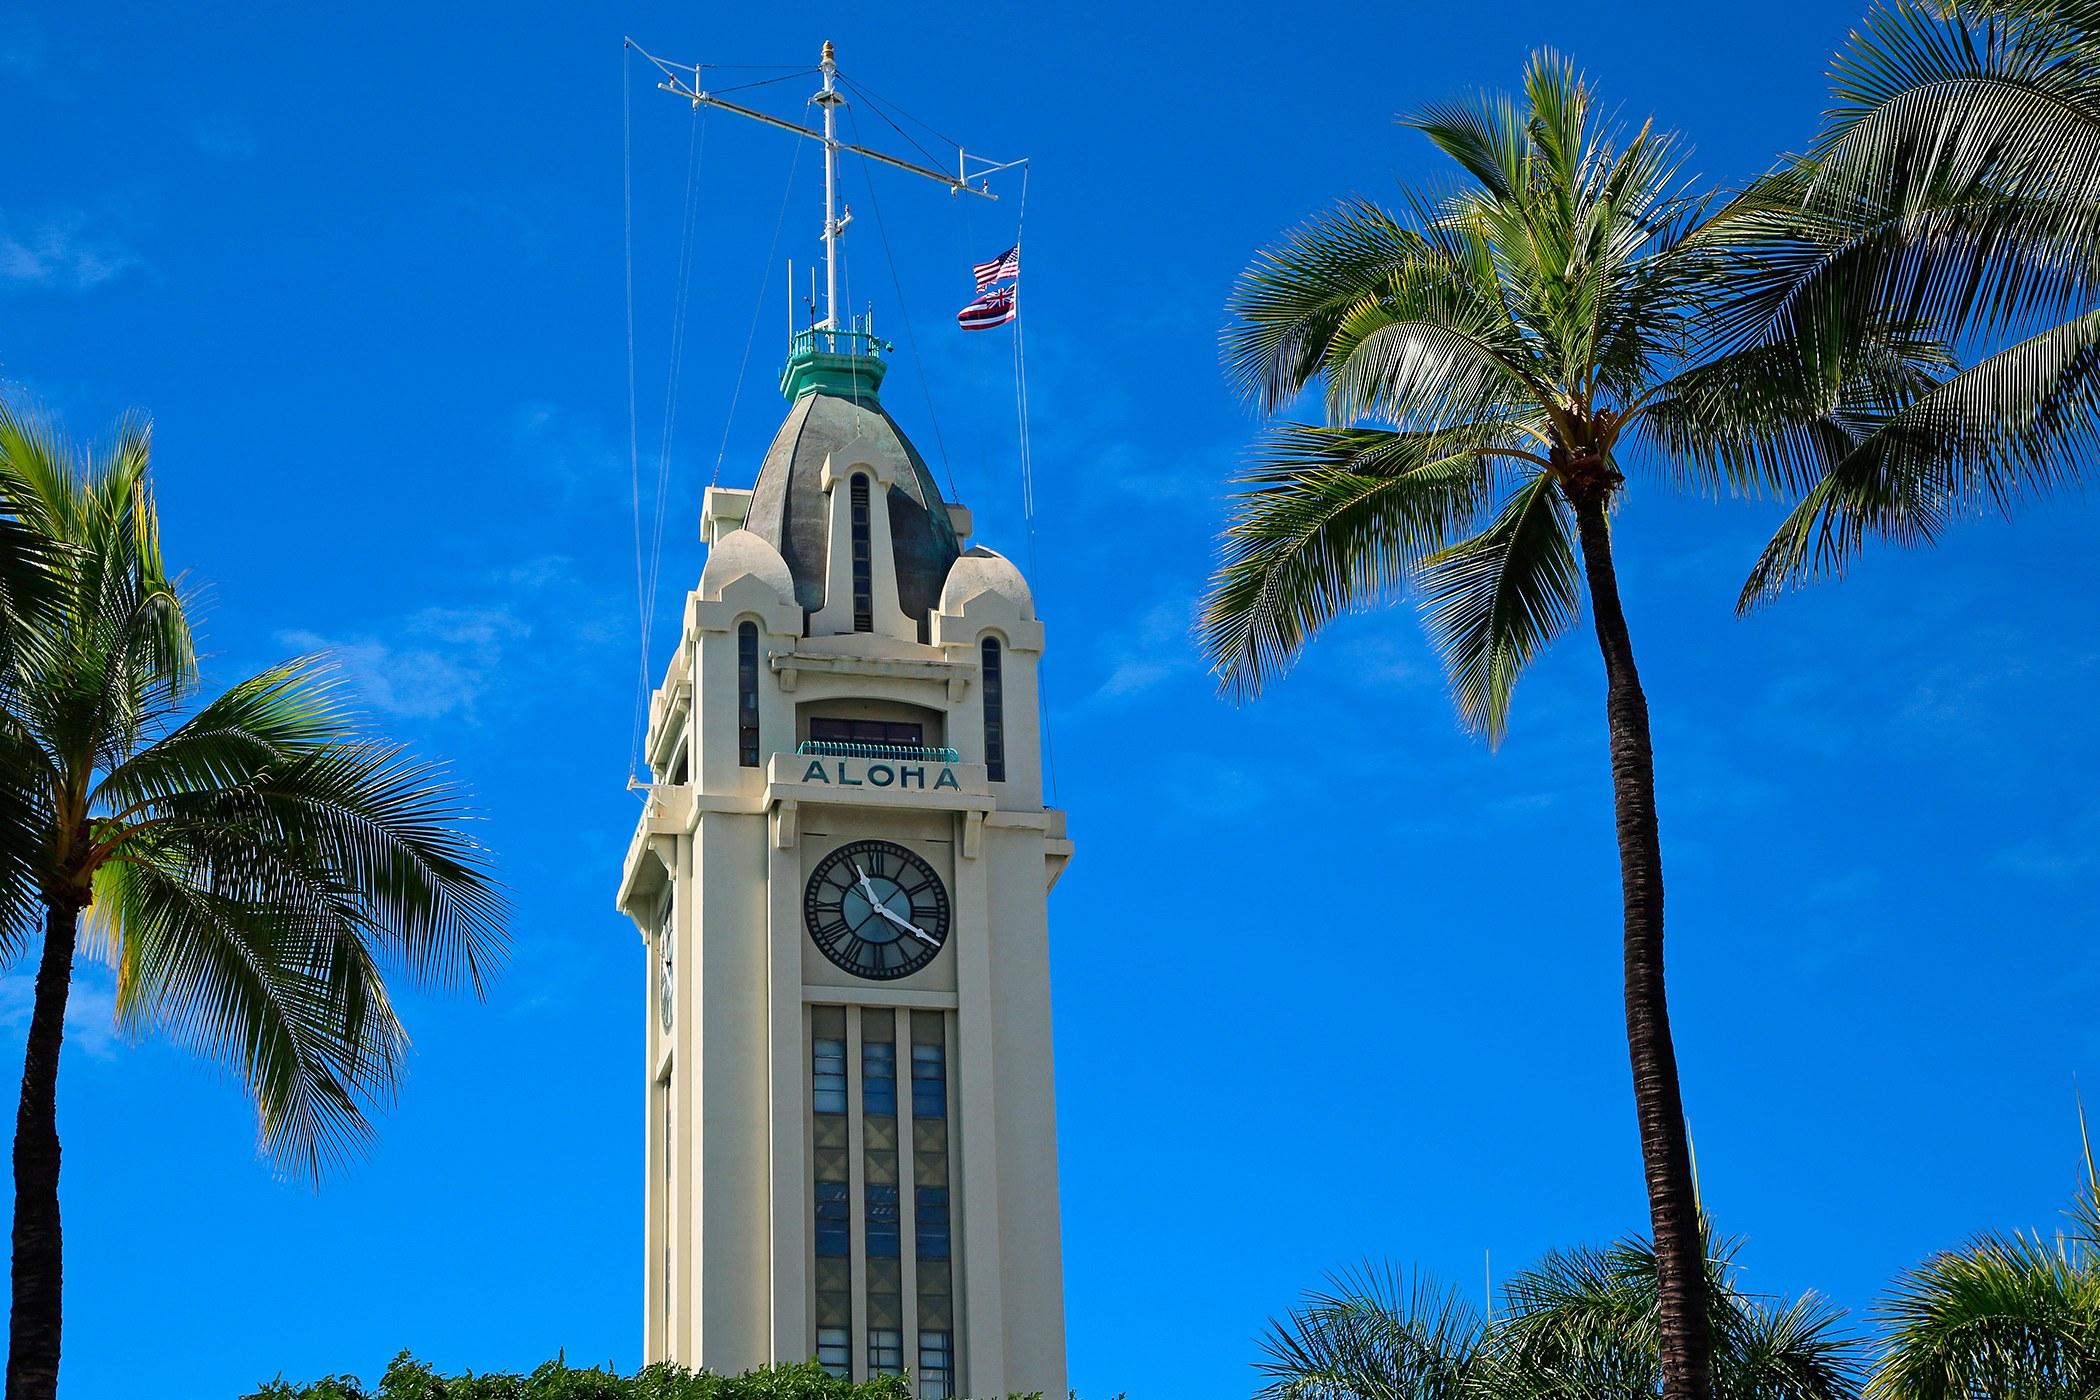 The-Royal-Hawaiian-Resort-Local-Attraction-aloha-tower-oahu